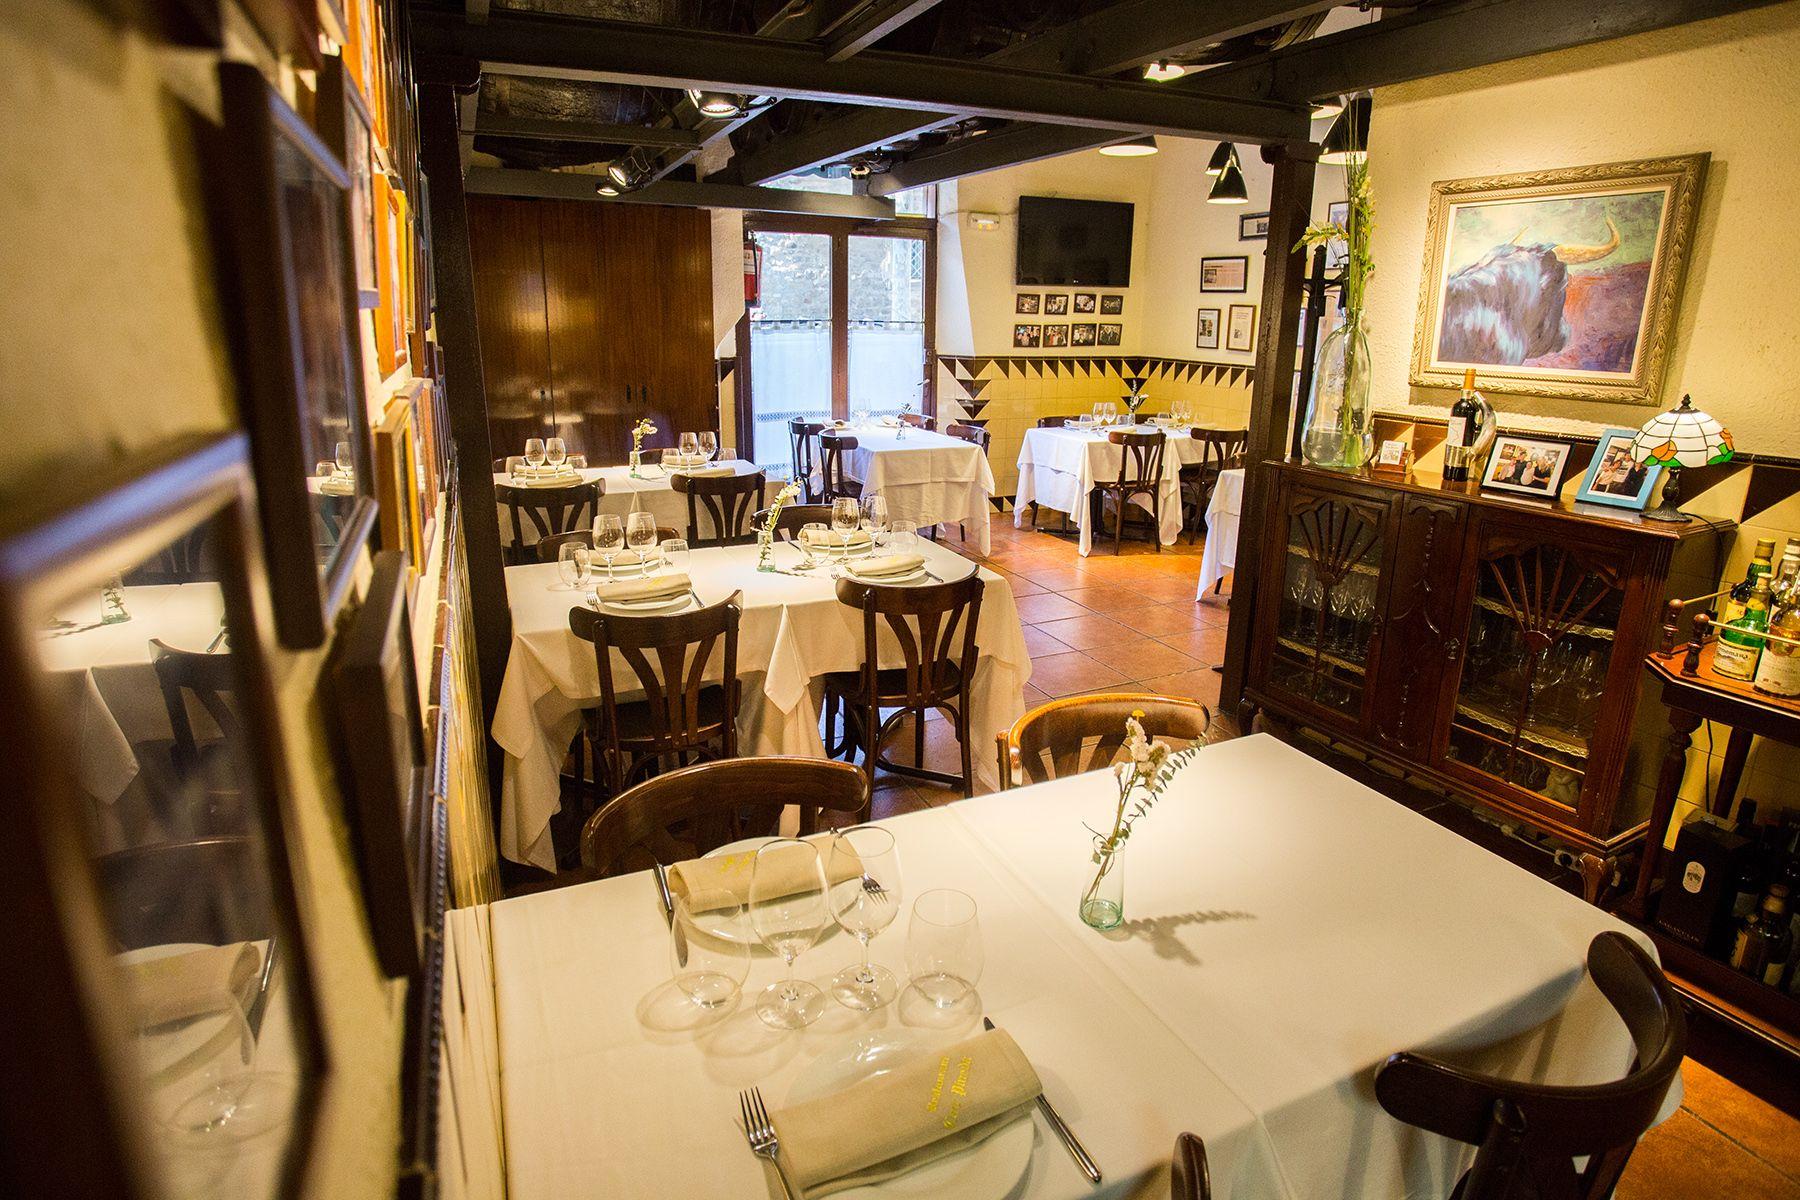 Restaurante cocina mediterránea Barcelona, Sant Martí